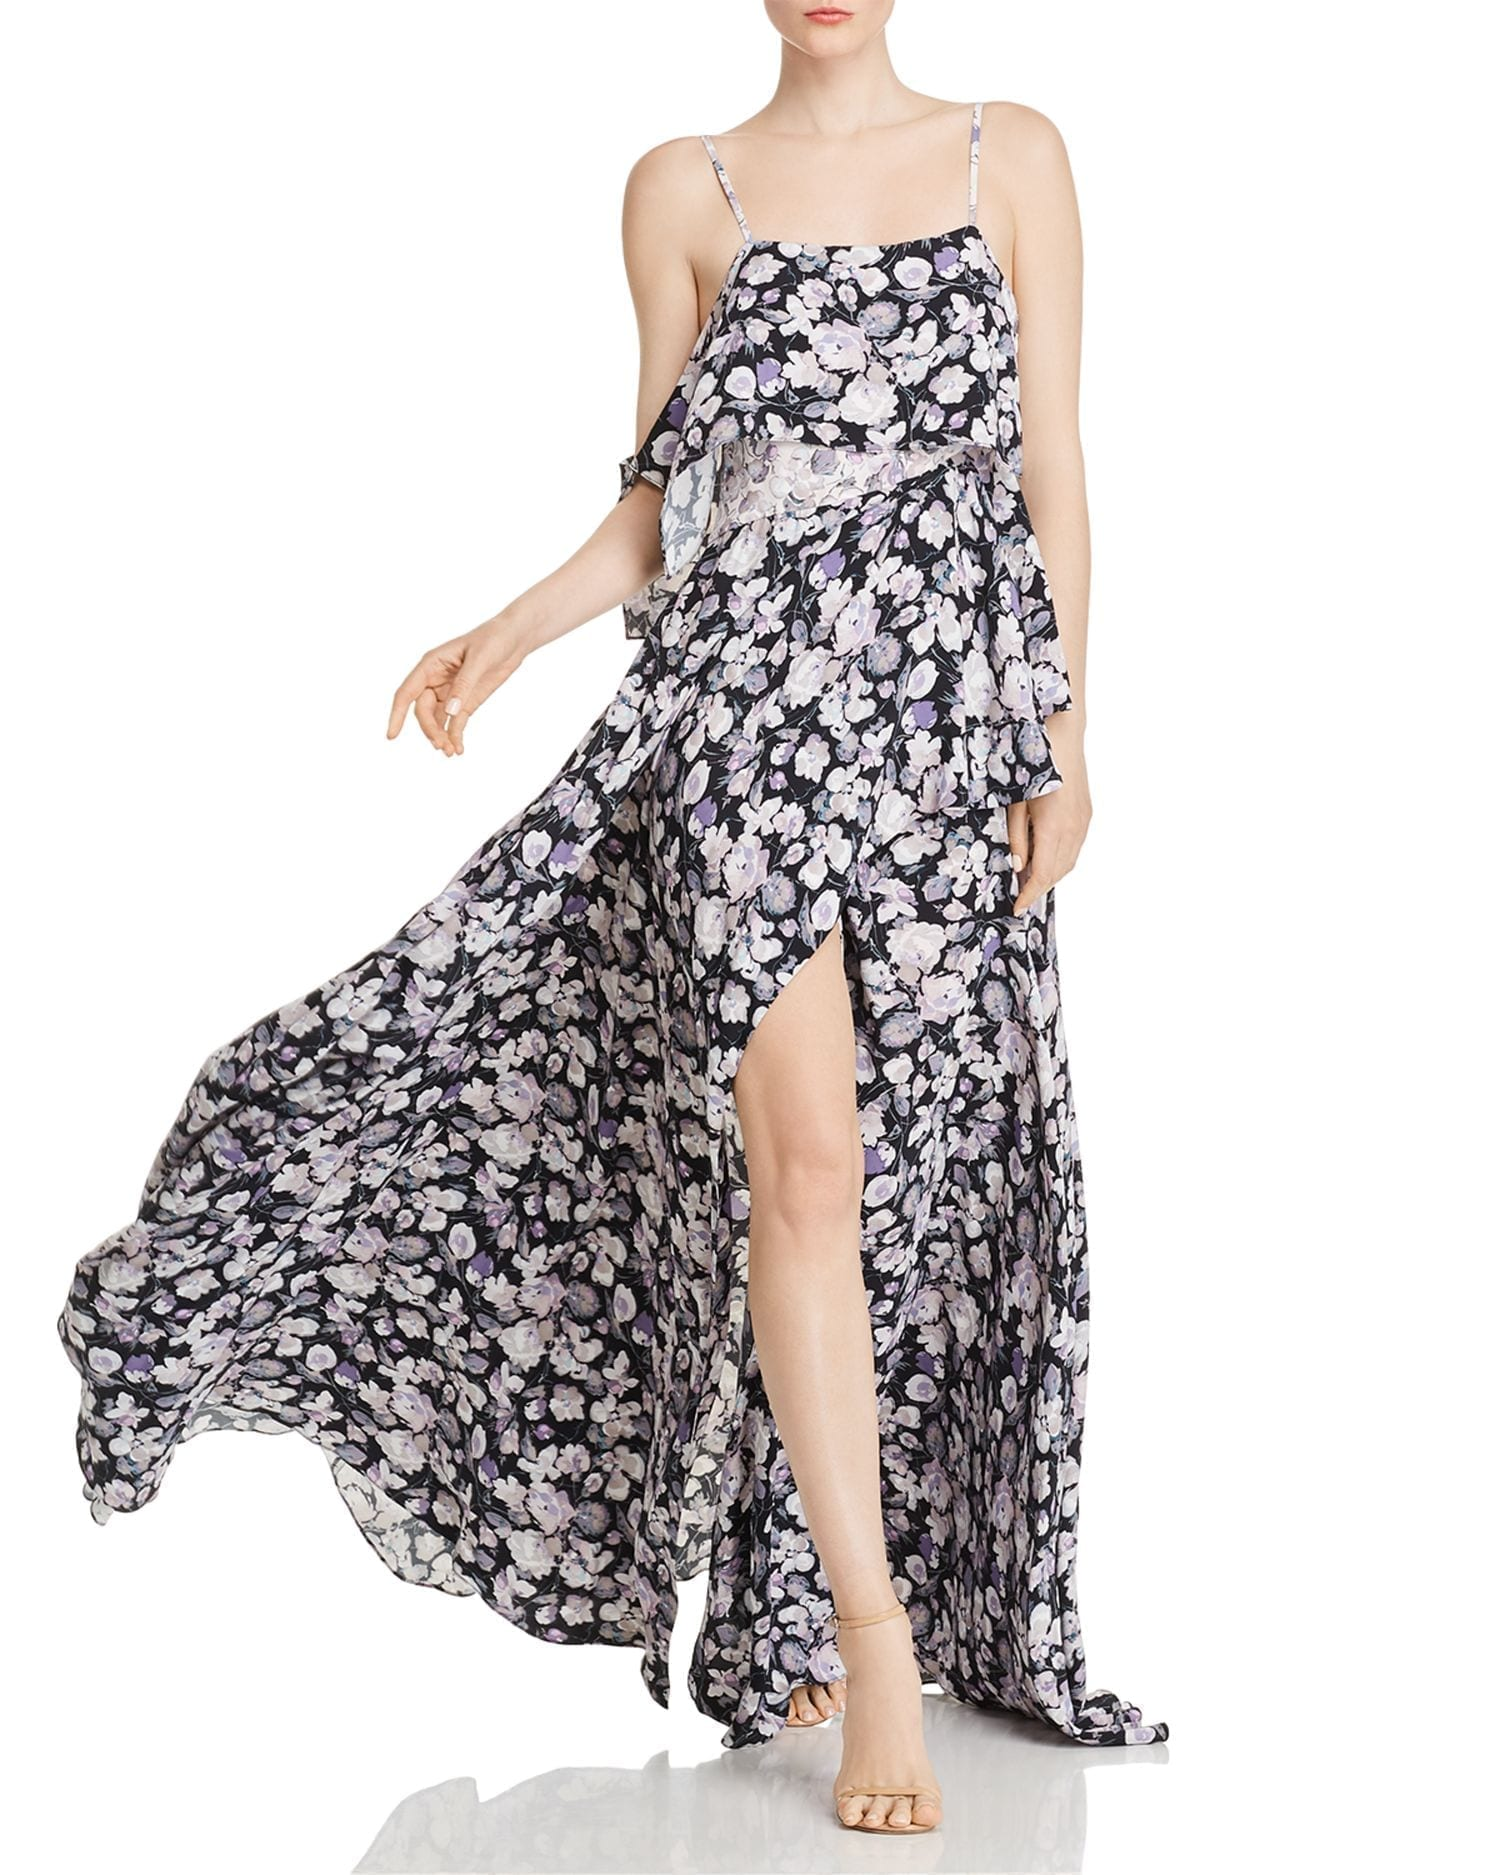 AMUR Calia Floral Dress